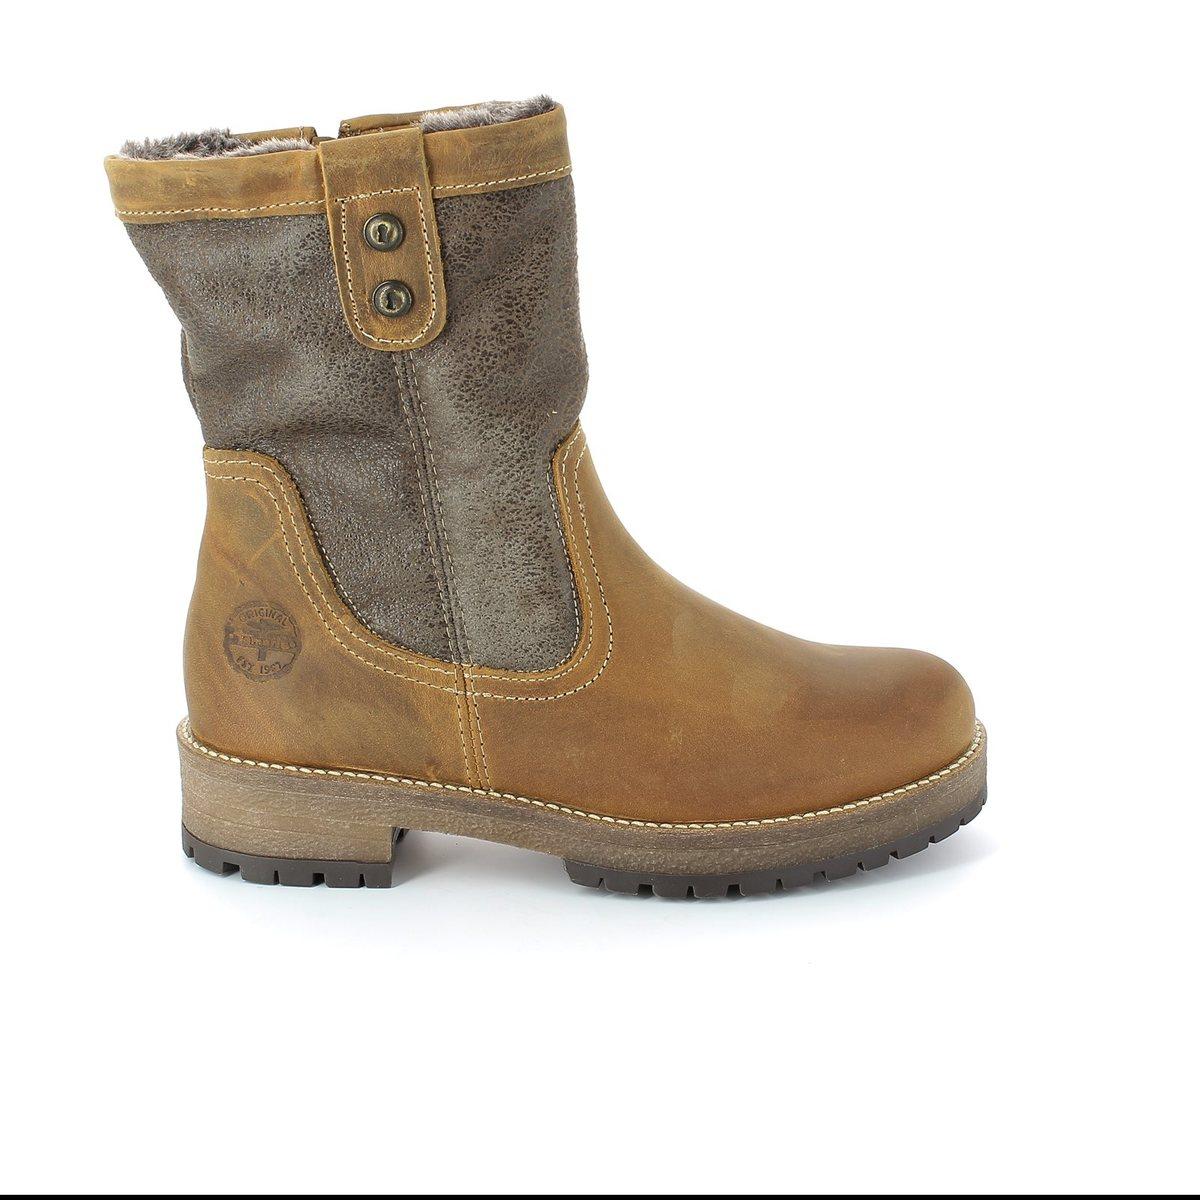 tamaris pitimber tex 26465 440 tan multi ankle boots. Black Bedroom Furniture Sets. Home Design Ideas